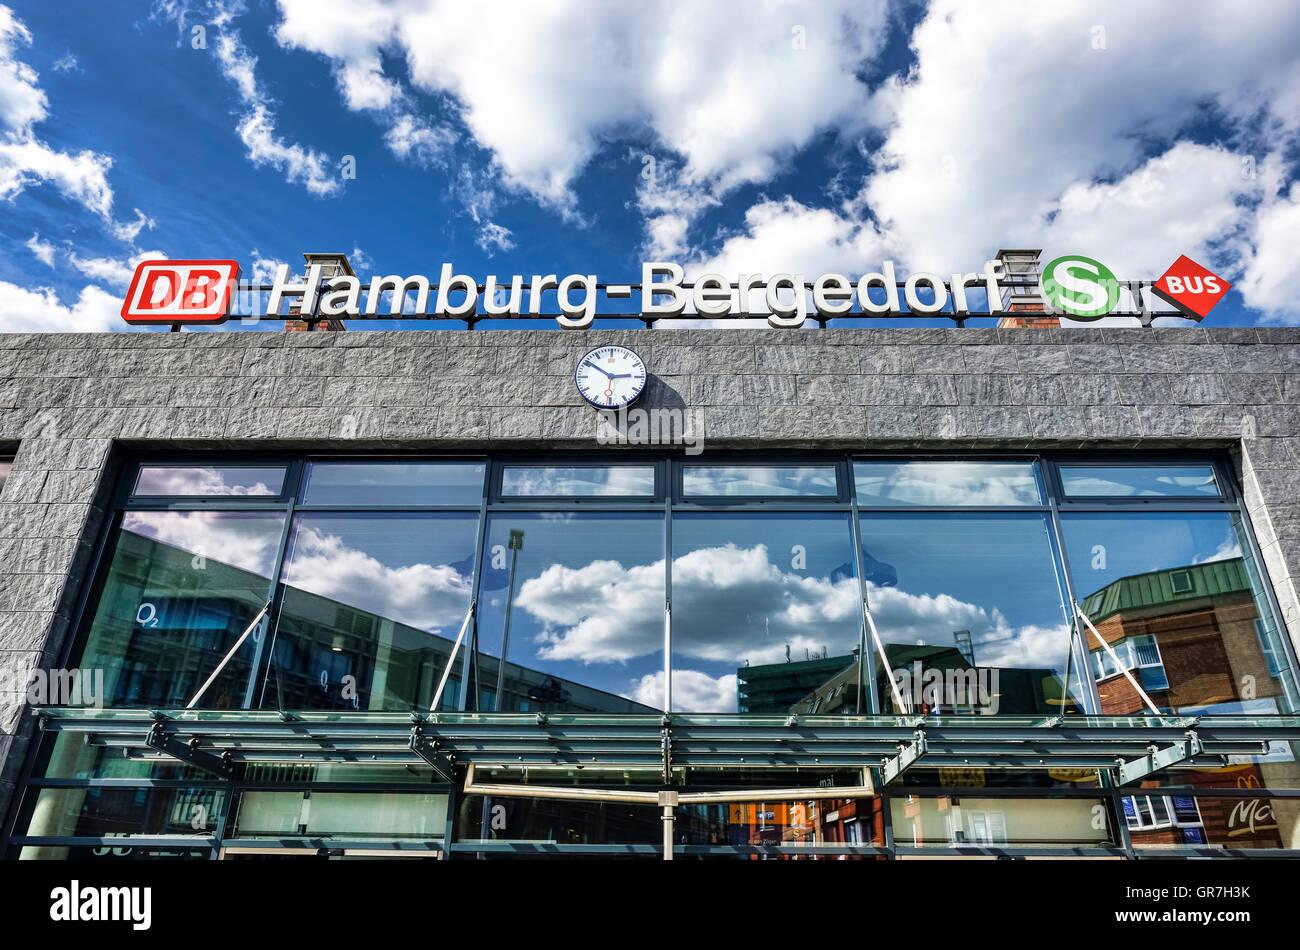 Bergedorf Bus And Railway Station In Hamburg, Germany - Stock Image